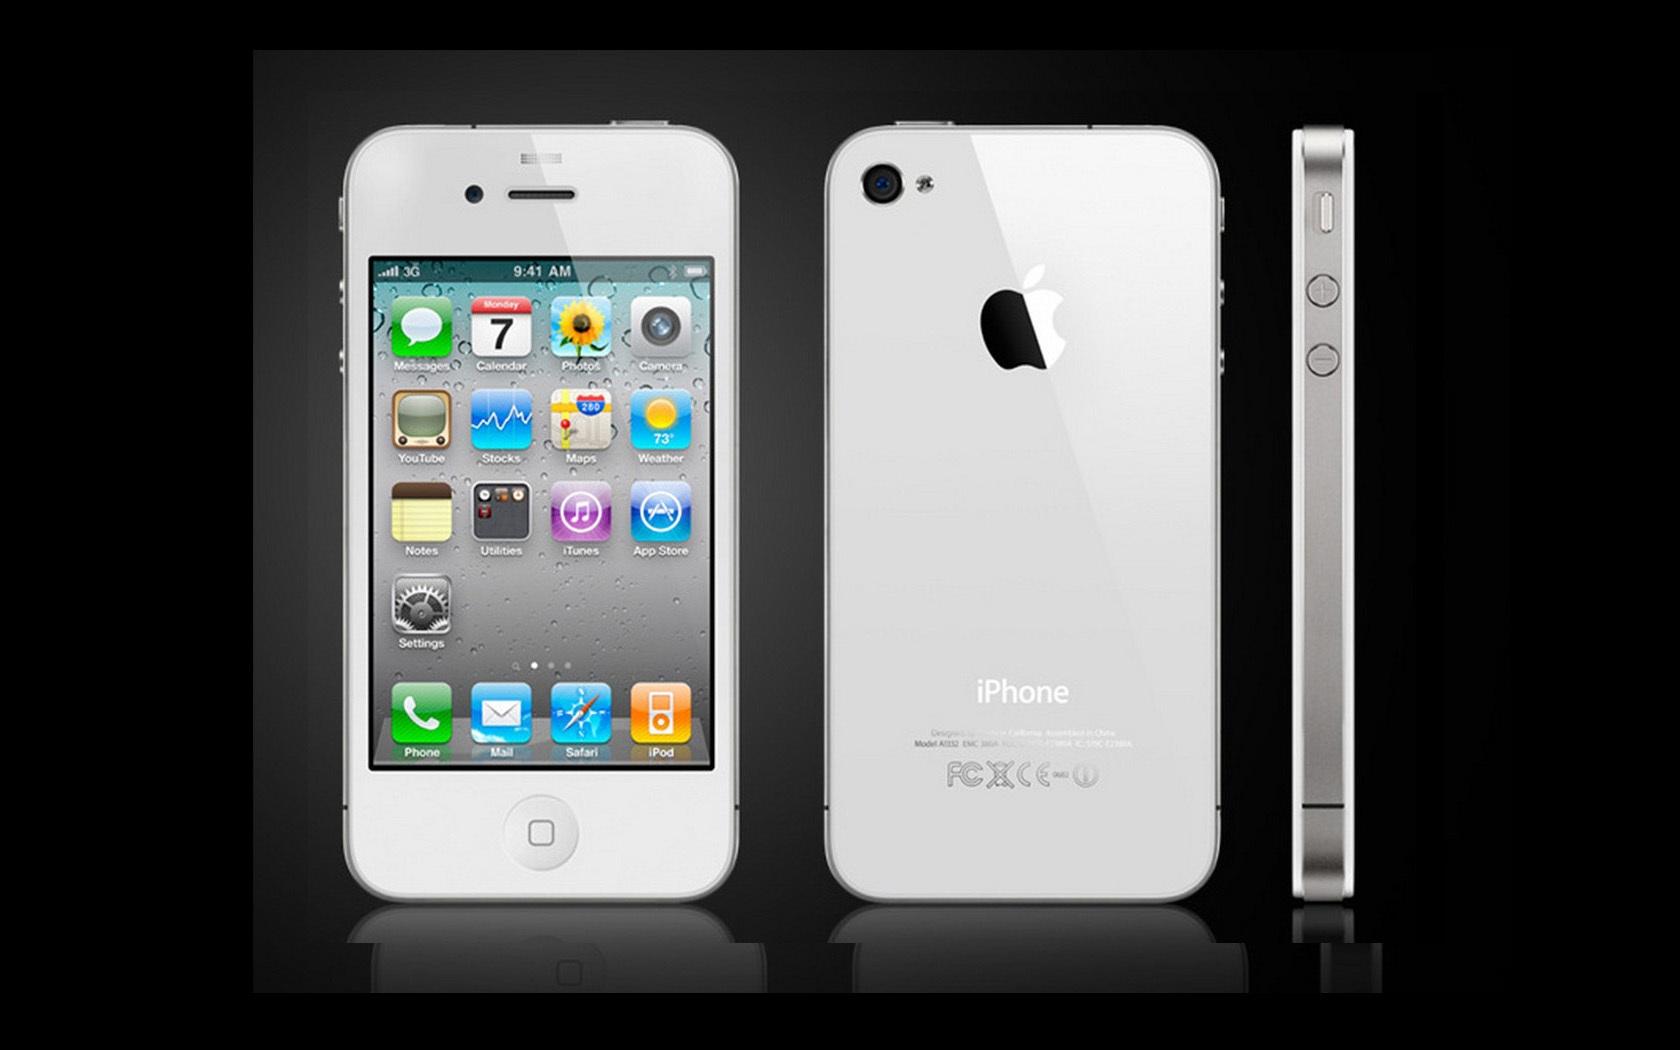 iphone 4s white wallpaper 1680x1050 resolution wallpaper